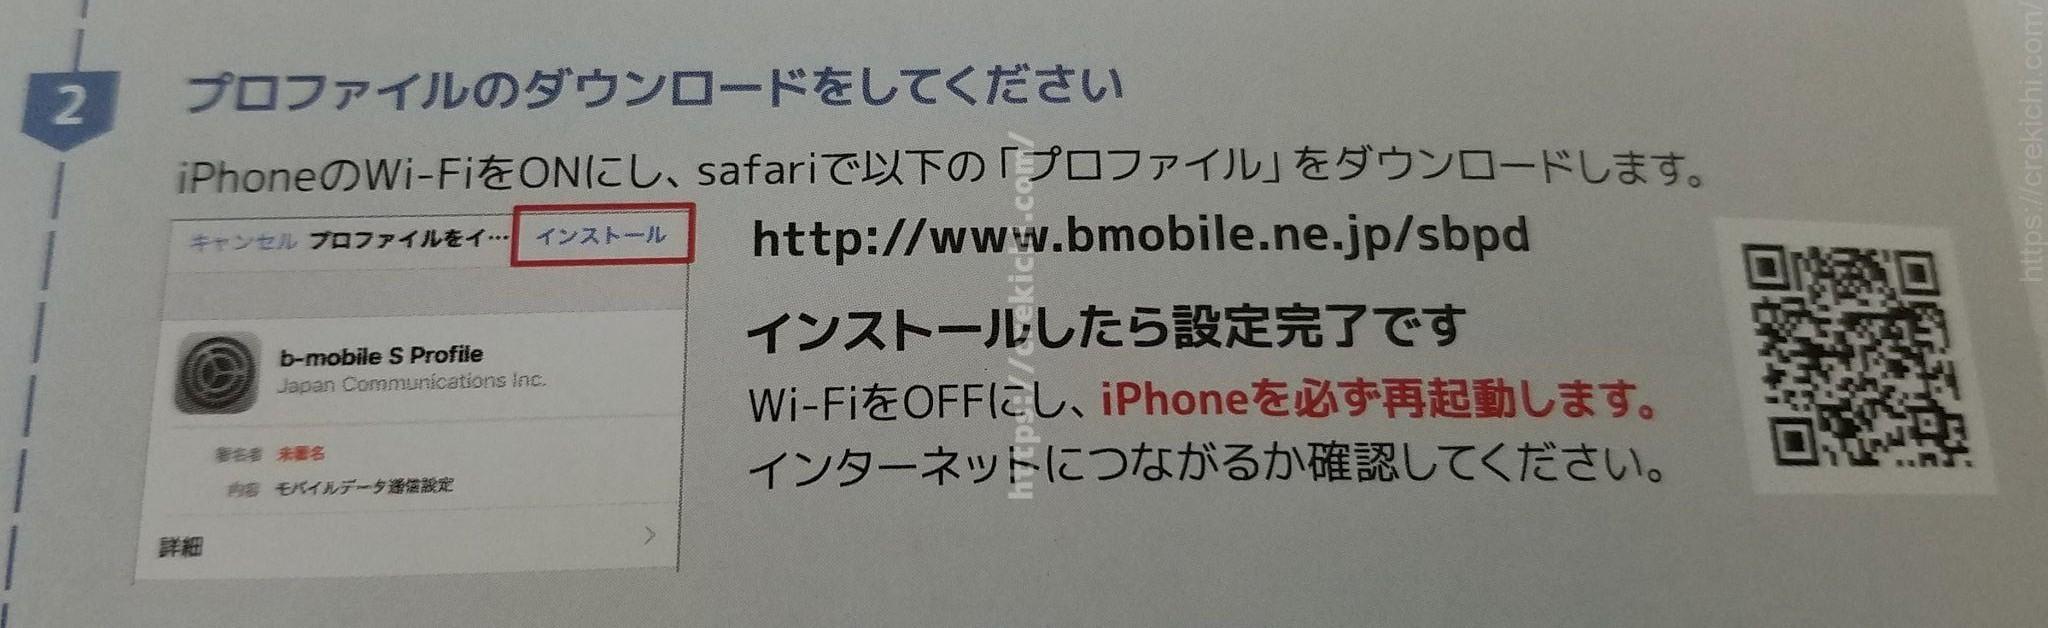 b-mobile S プロファイルのインストール